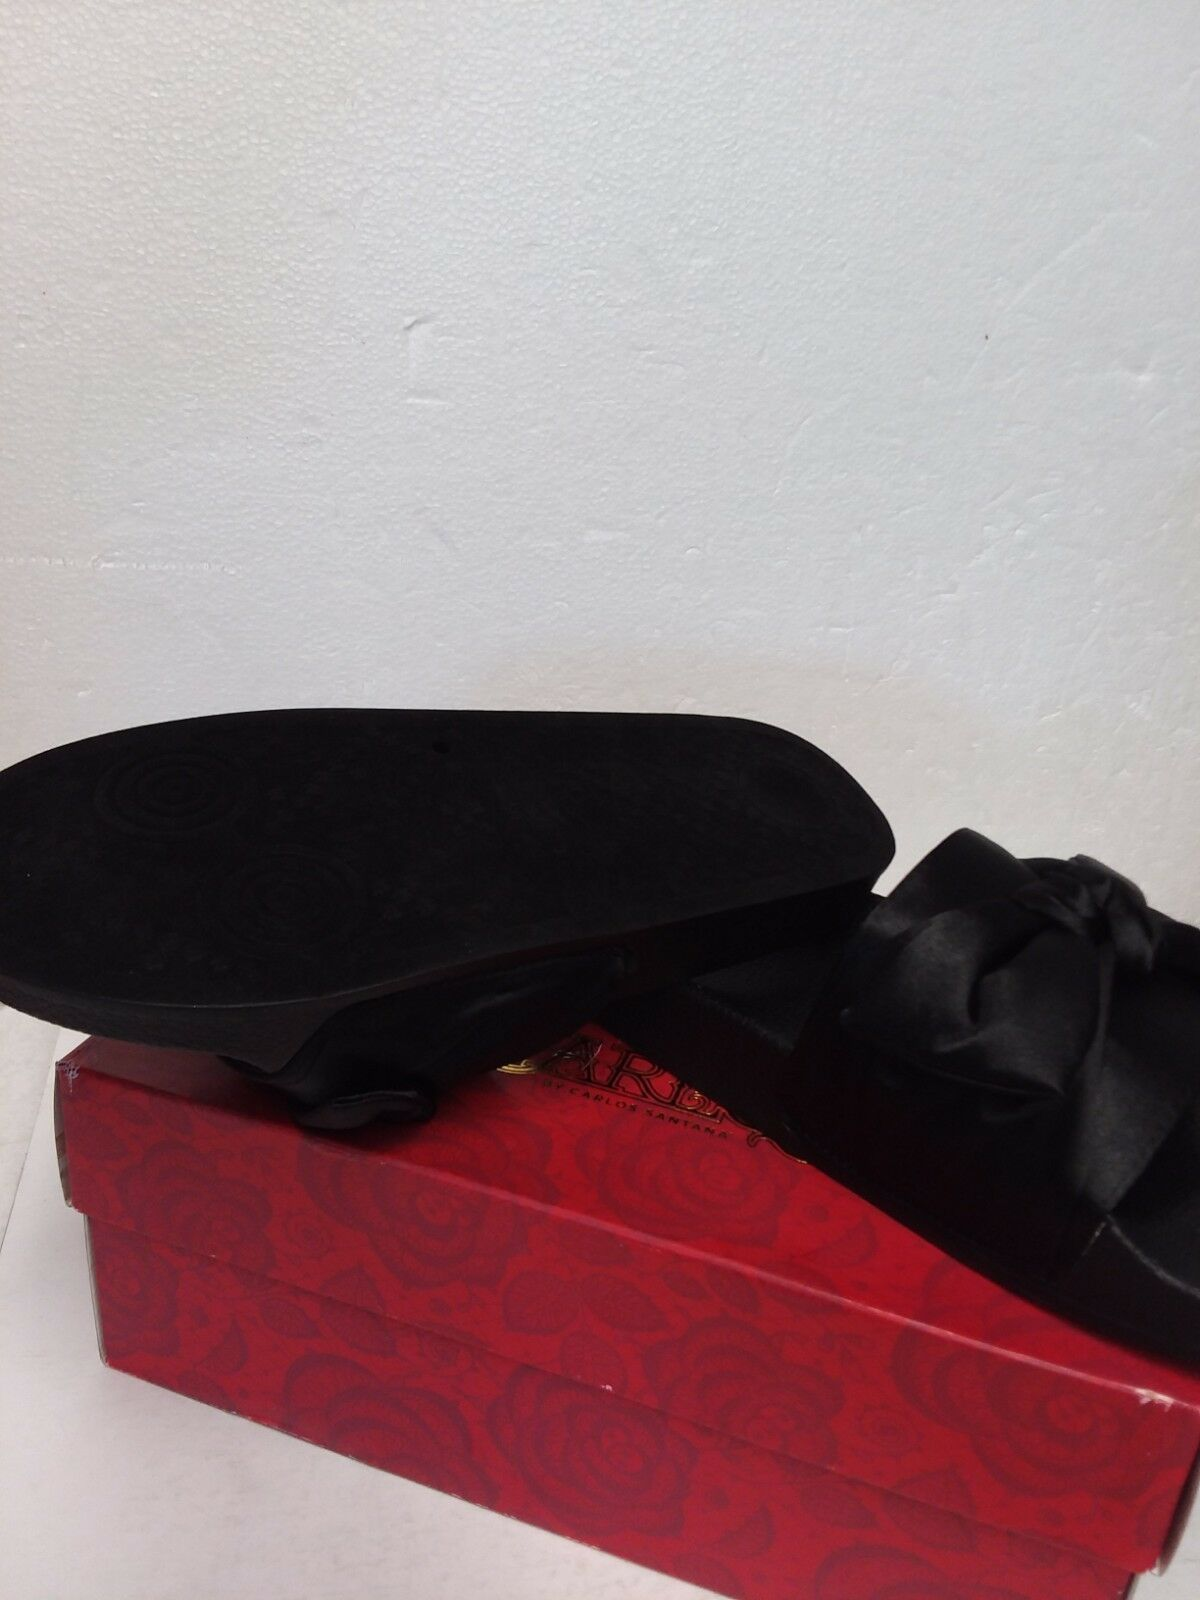 Carlos by Carlos Santana Bayside Slide Sandals, Black, 9 US / 39 EU